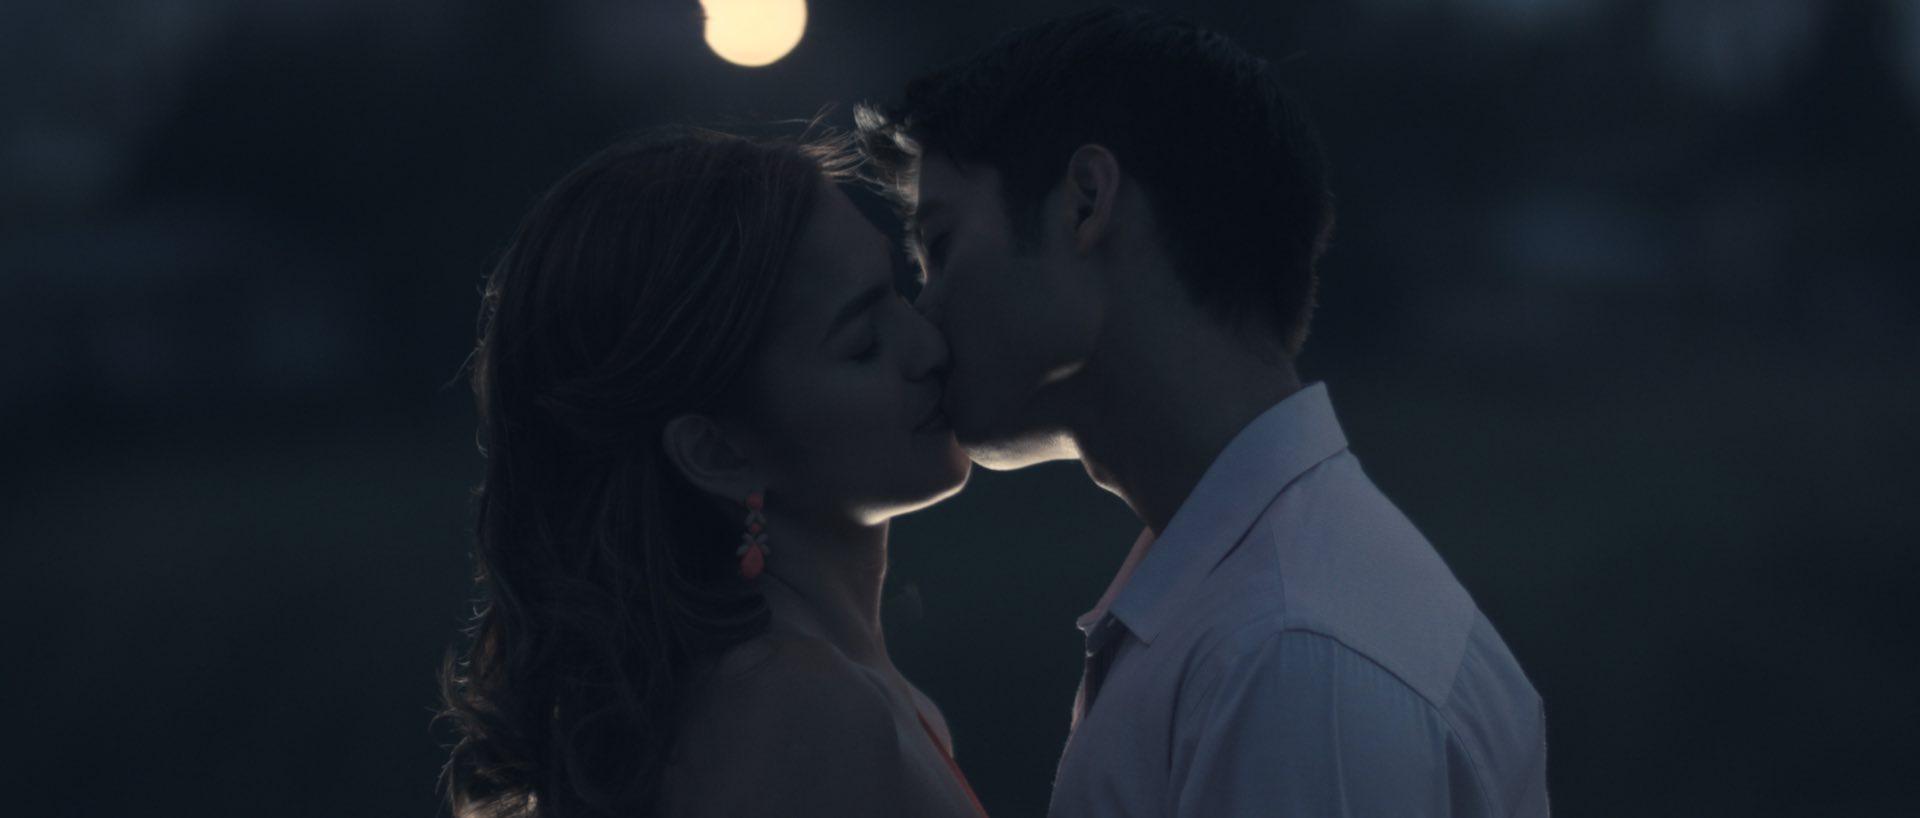 ANGELA_MARCO_KISS.jpeg